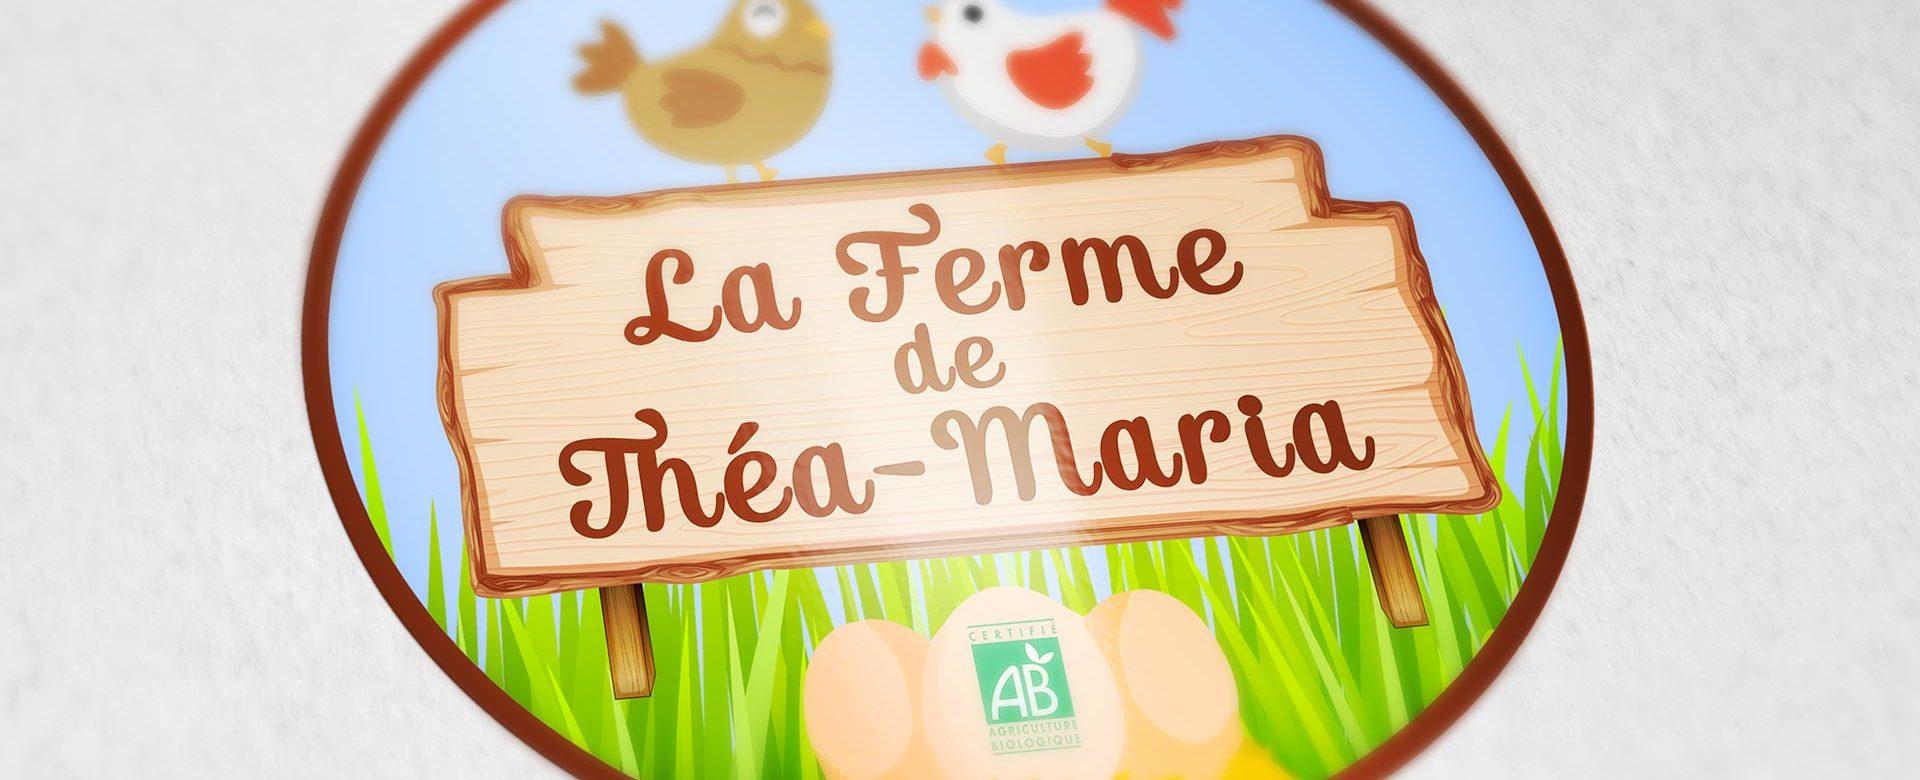 la-ferme-de-thea-maria-logo-corse